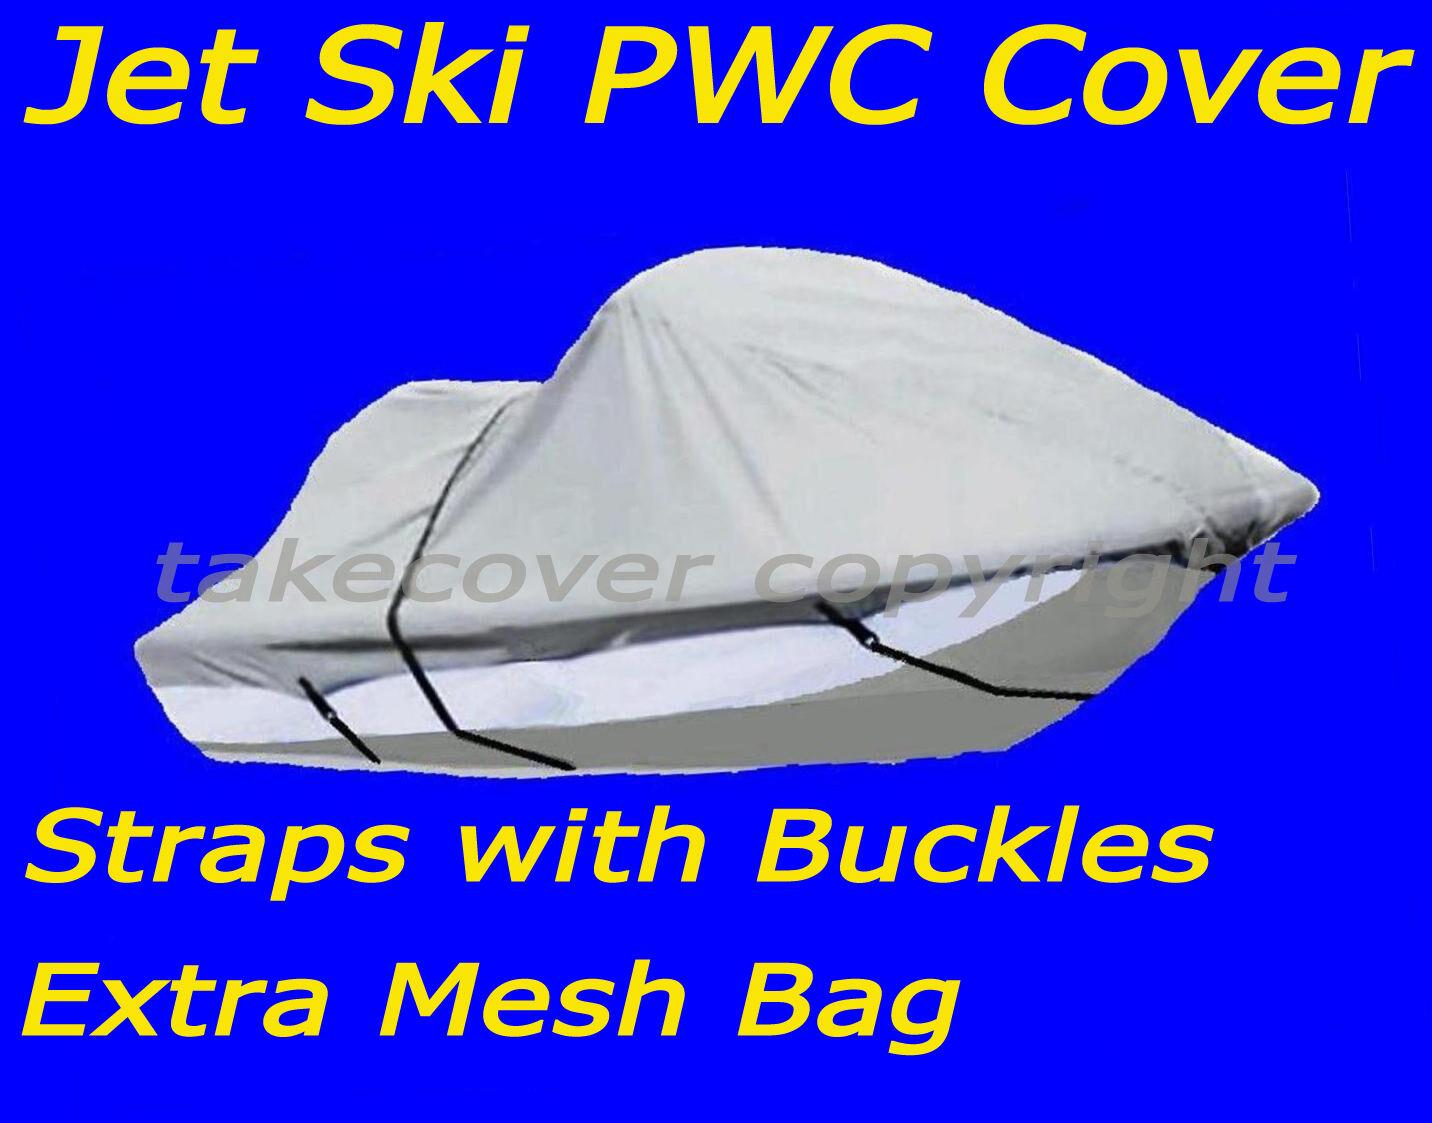 Jet Ski PWC personal watercraft Cover Sea Doo Polaris Yamaha Kawasaki t923yDc